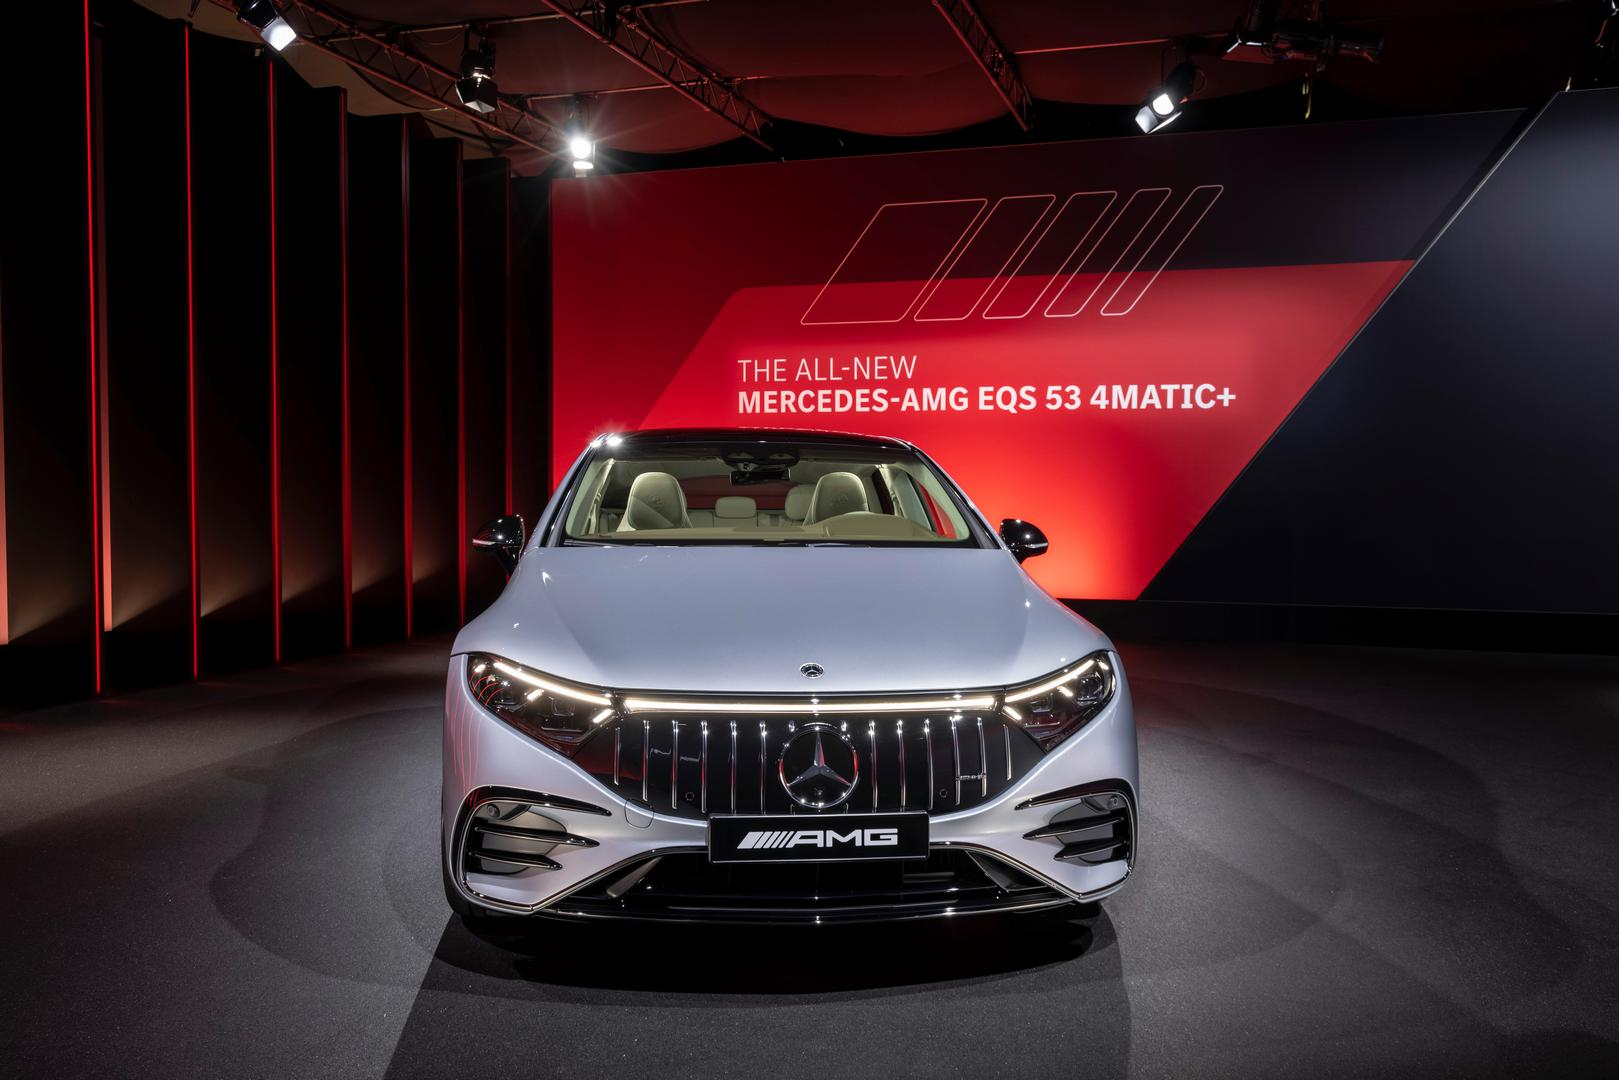 Mercedes-AMG EQS 53 4MATIC+, 2021Mercedes-AMG EQS 53 front